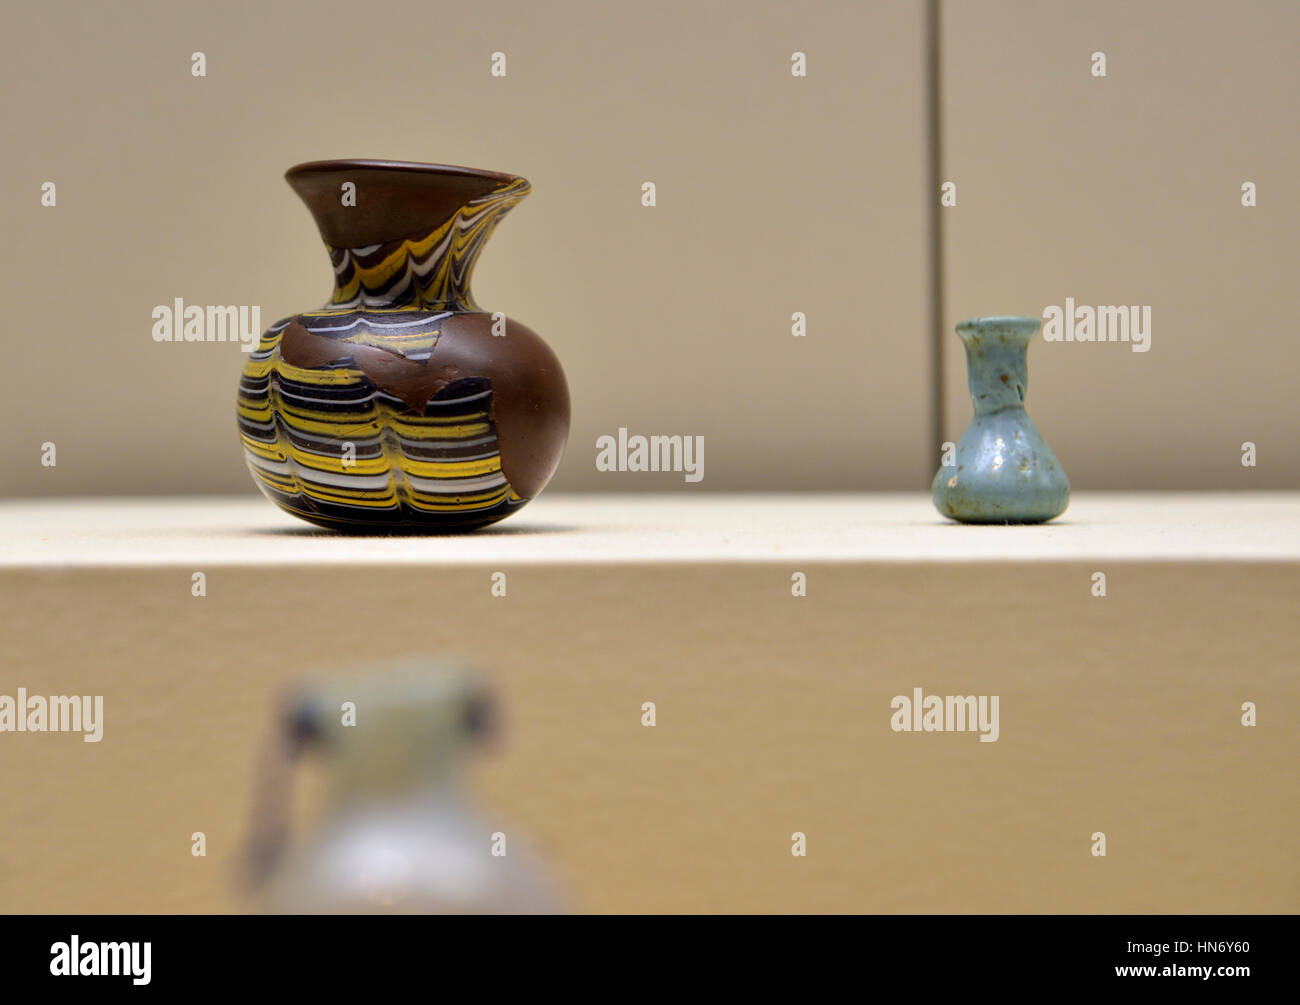 Beaker. Qaryat al-Faw. 1st century CE. Blown glass. National Museum, Riyadh. Saudi Arabia. - Stock Image